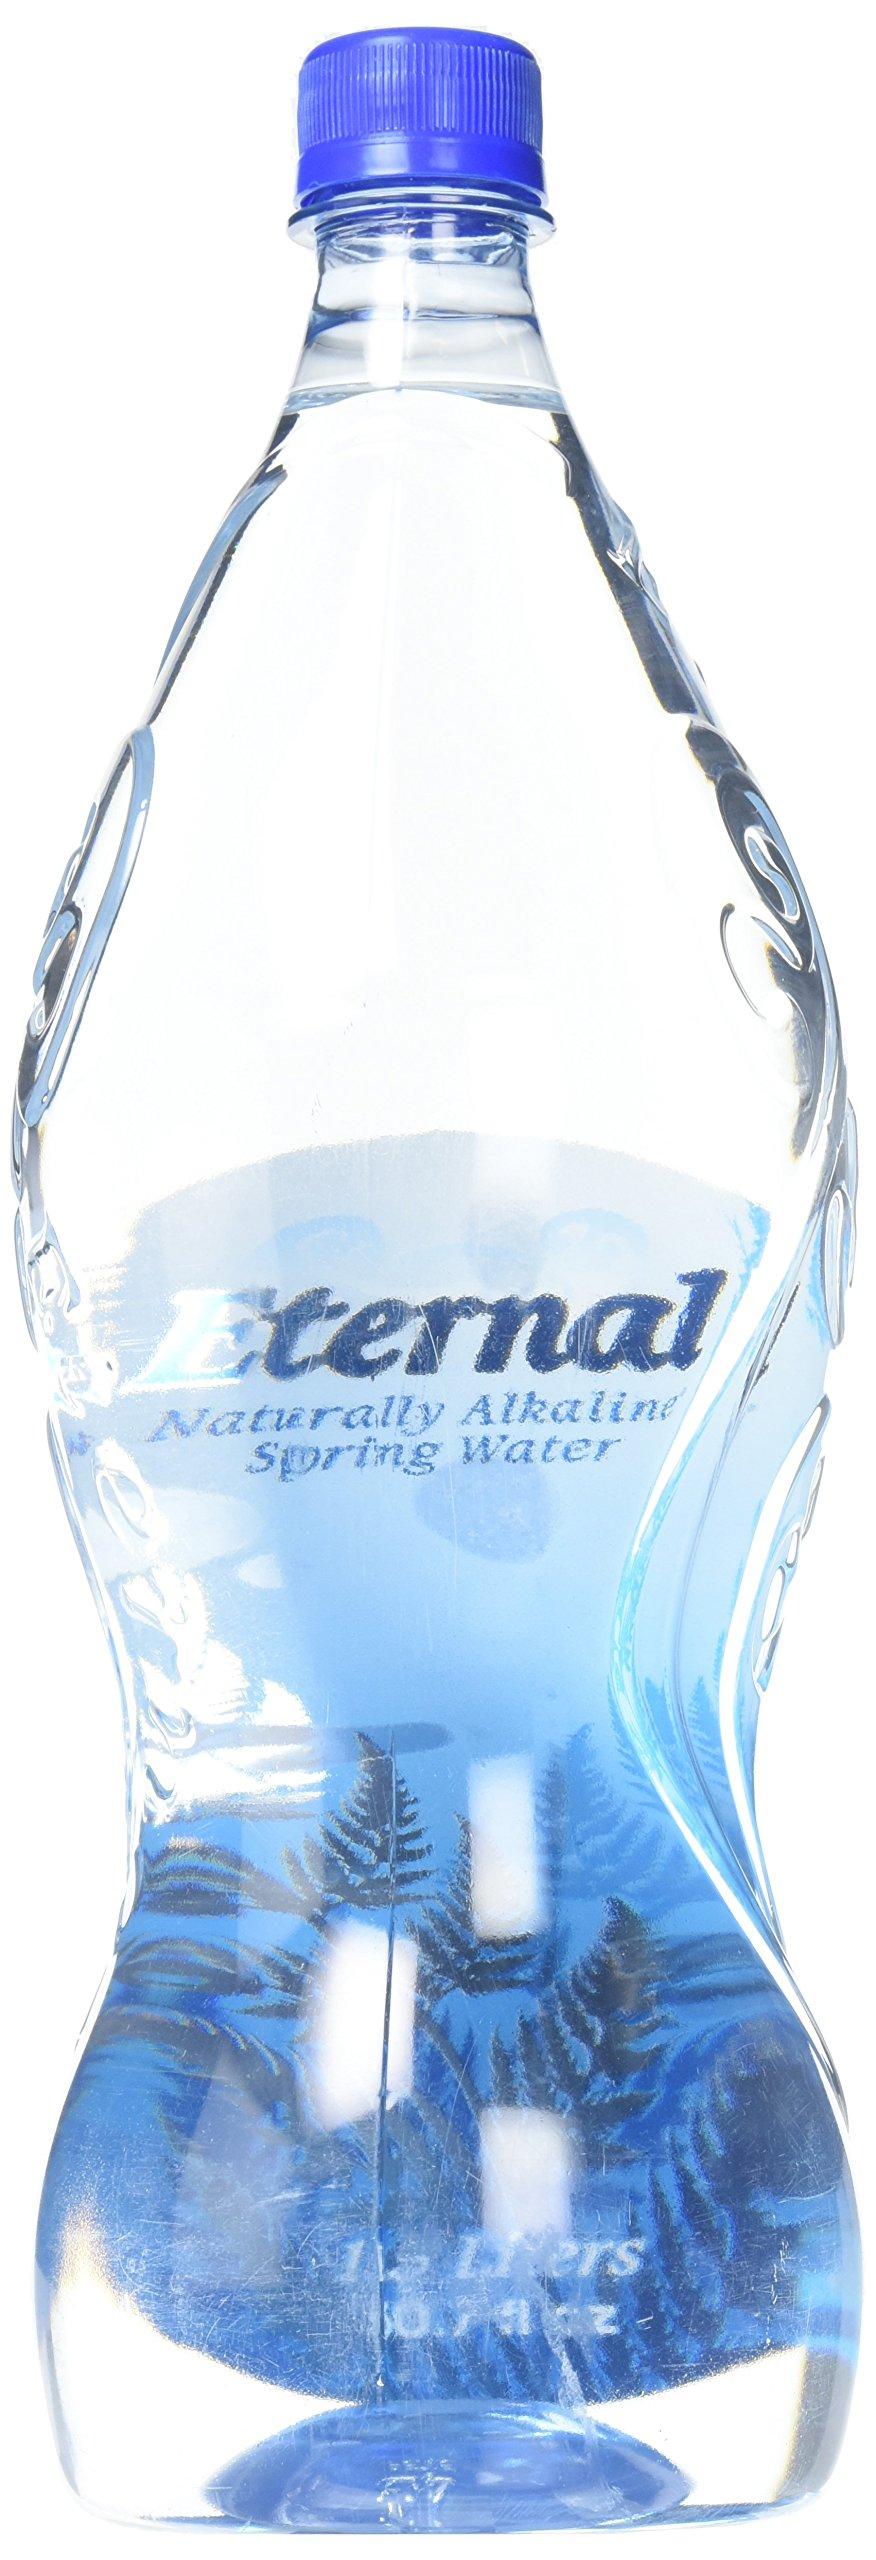 Eternal Artesian Water - 50.72103 oz